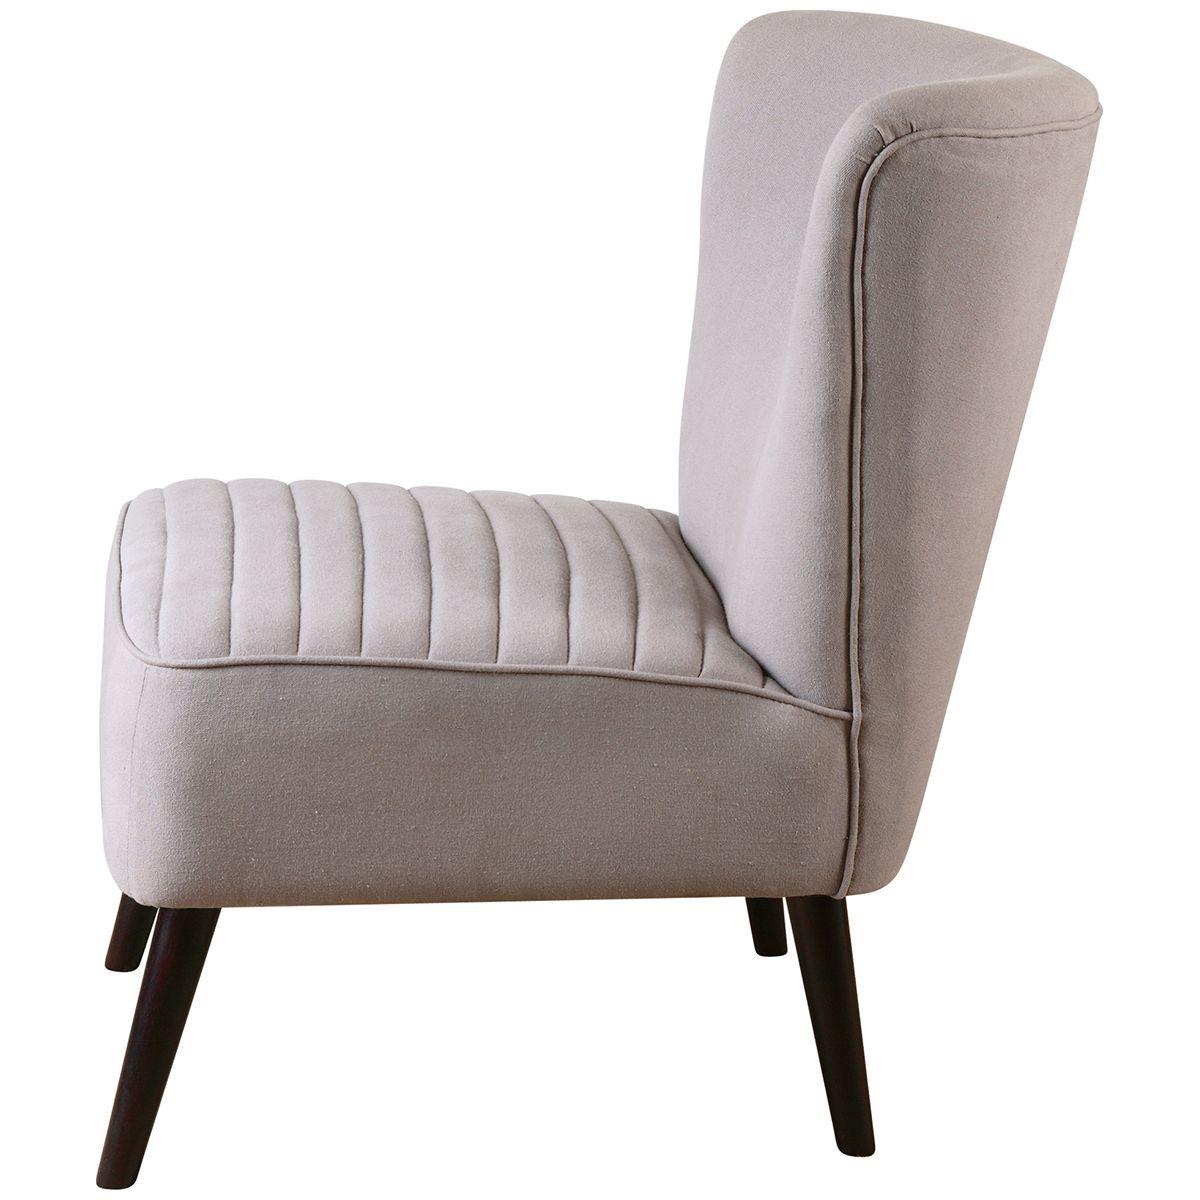 Uttermost Zaine Gray Armless Chair 23201